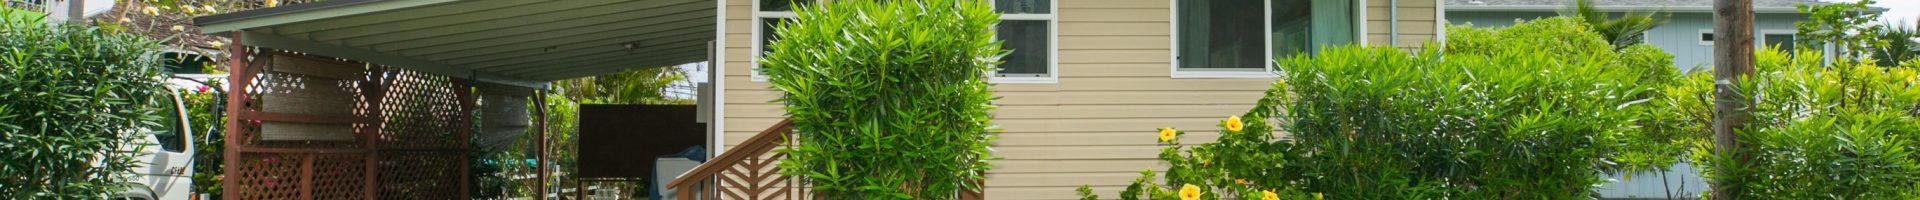 Hauula |  North Shore |  53-866 Kamehameha Hwy, #C3